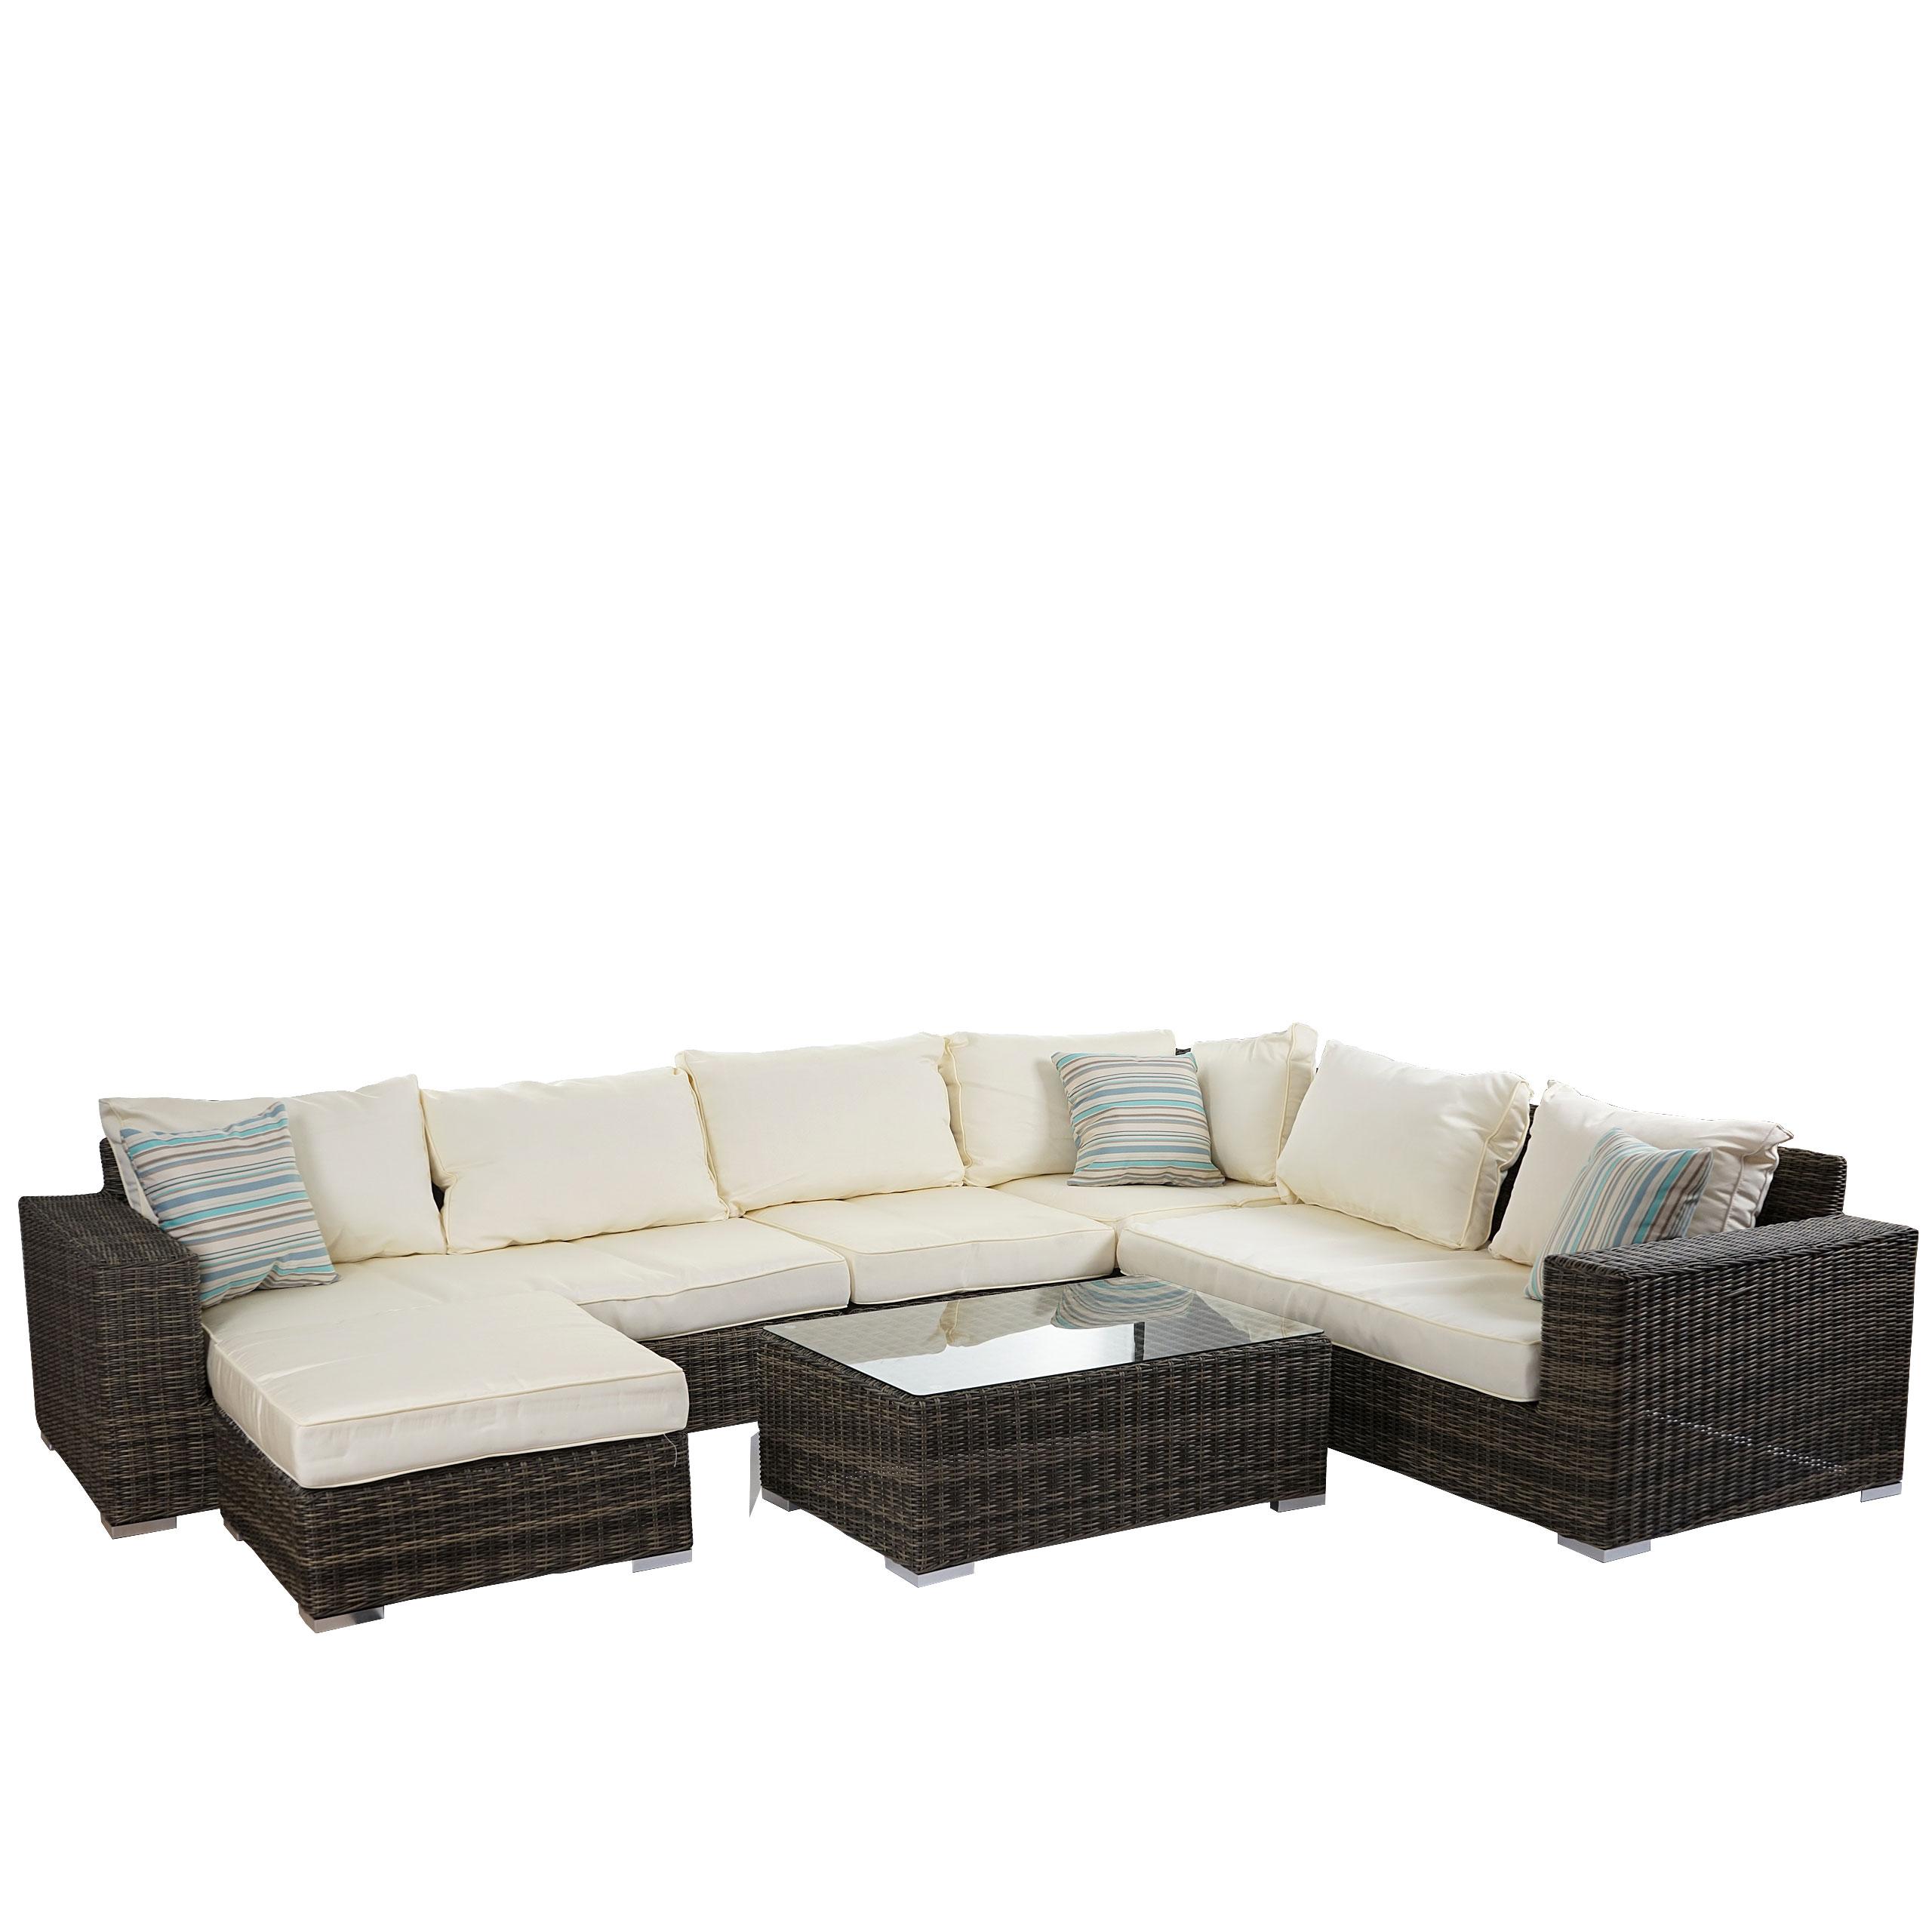 Luxus Poly Rattan Sofa Garnitur Melilla Lounge Set Alu Gestell